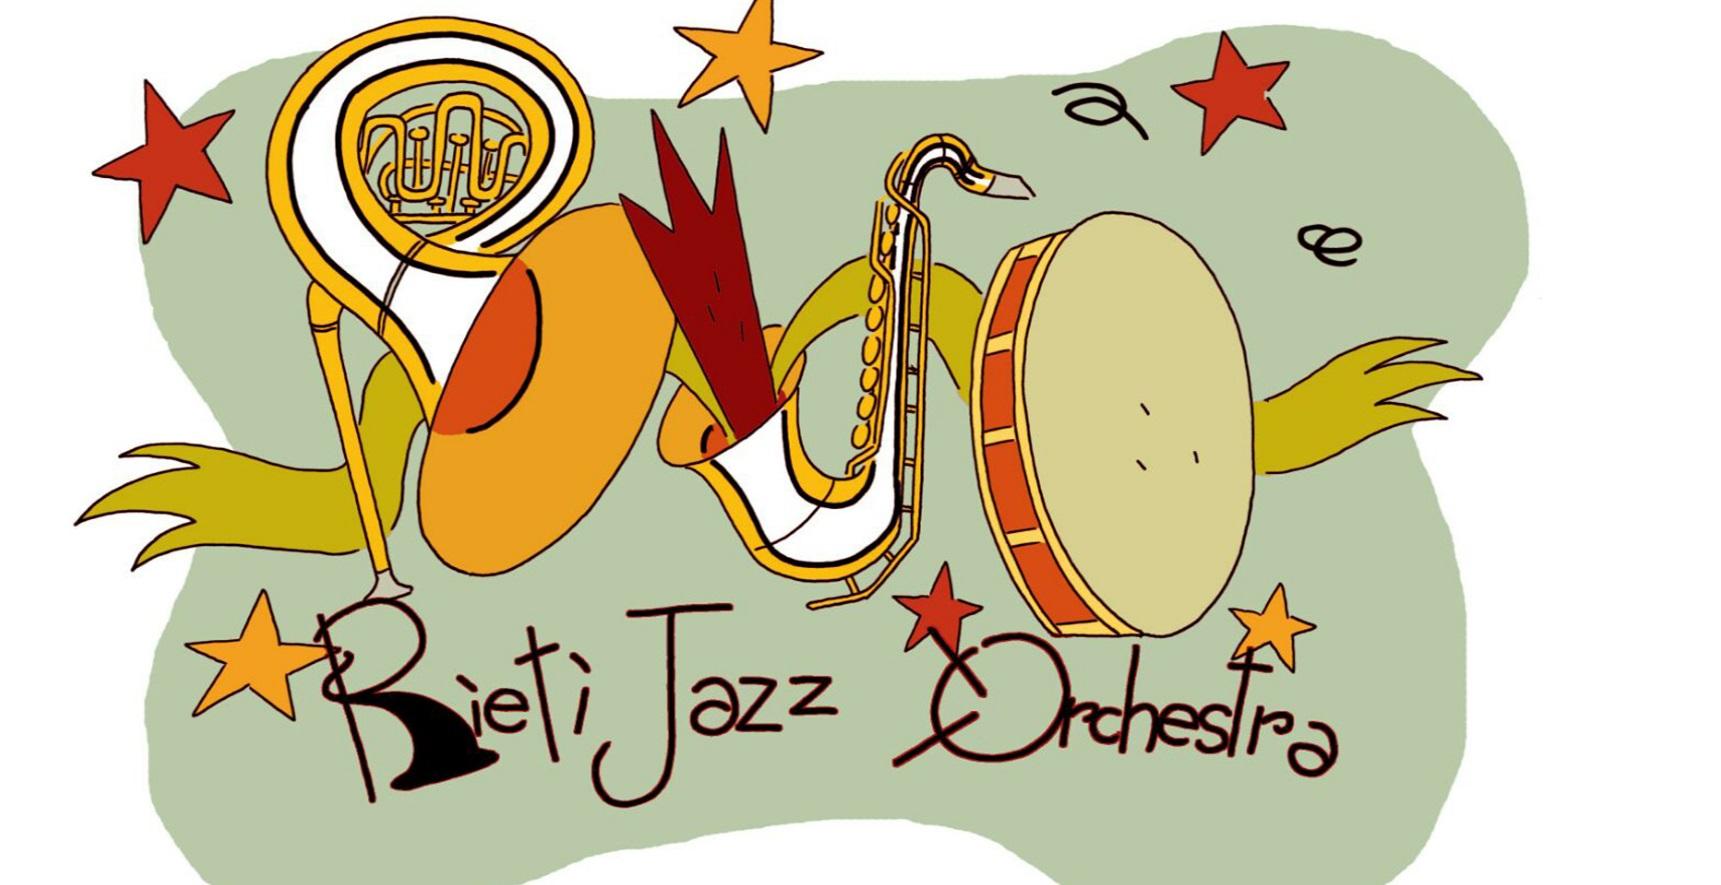 Rieti Jazz Orchestra